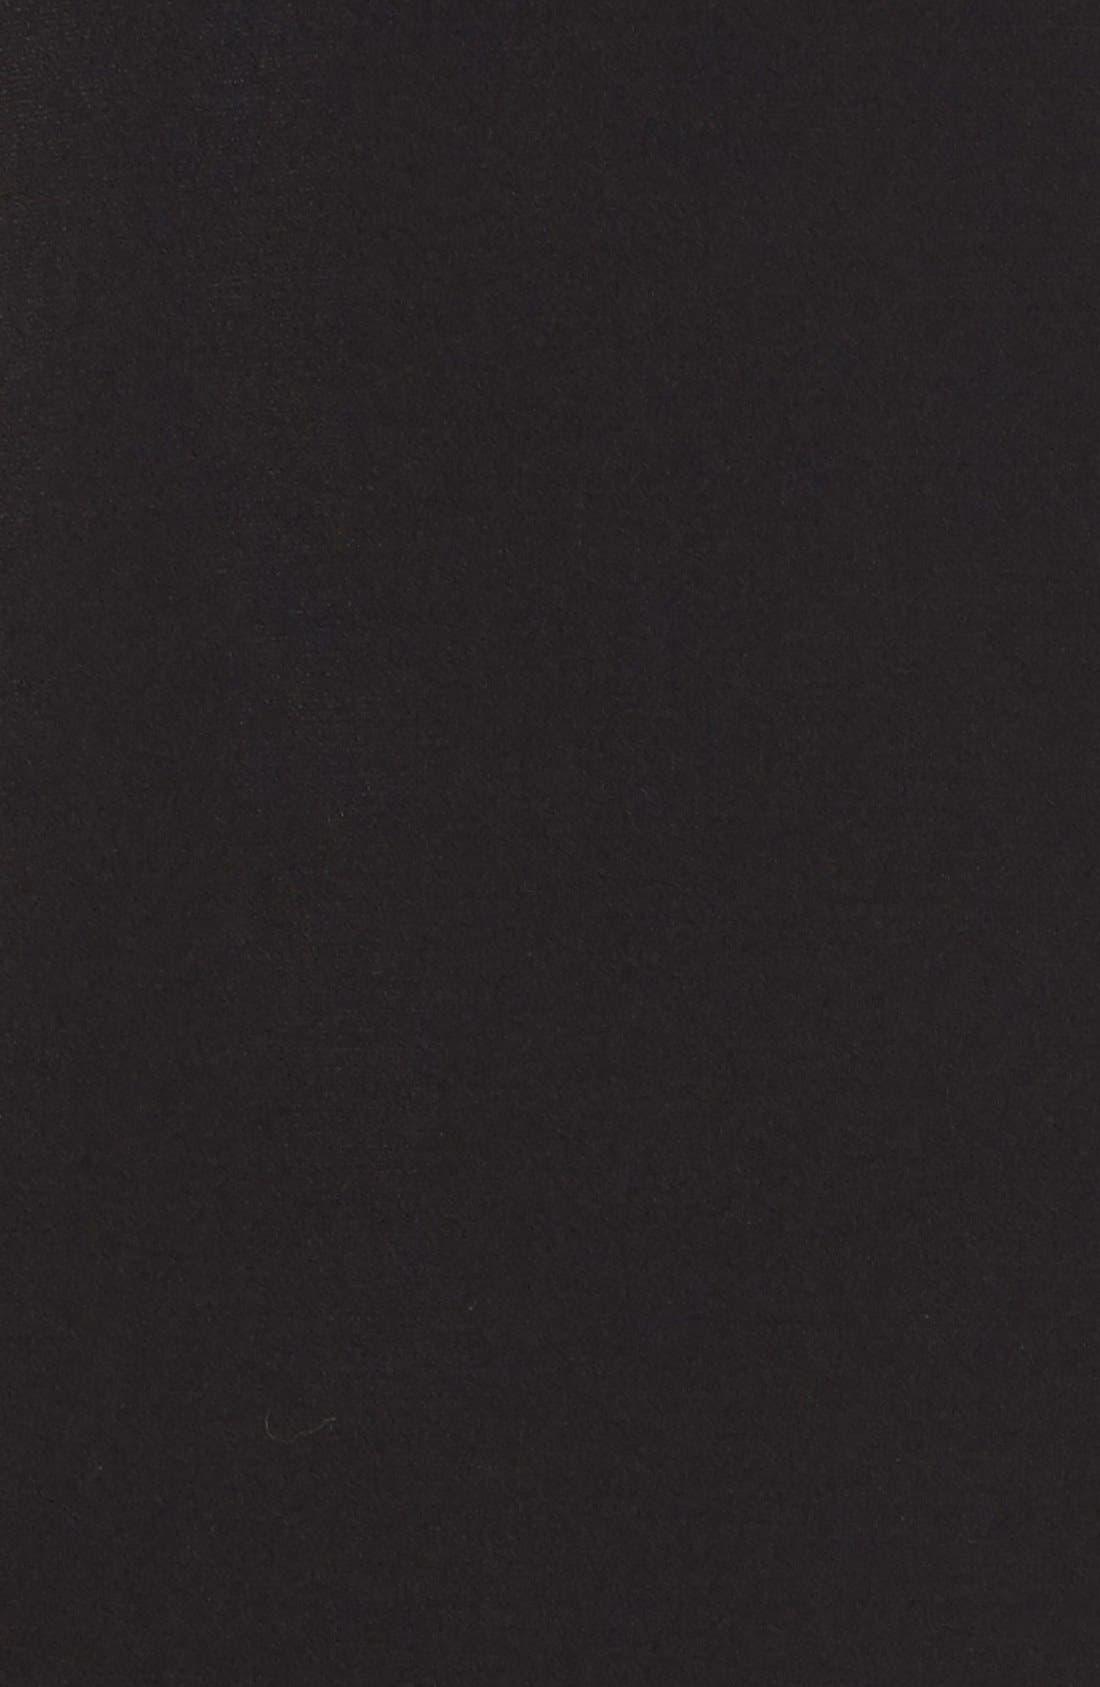 Studded Asymmetrical Shift Dress,                             Alternate thumbnail 5, color,                             Black/ Gold